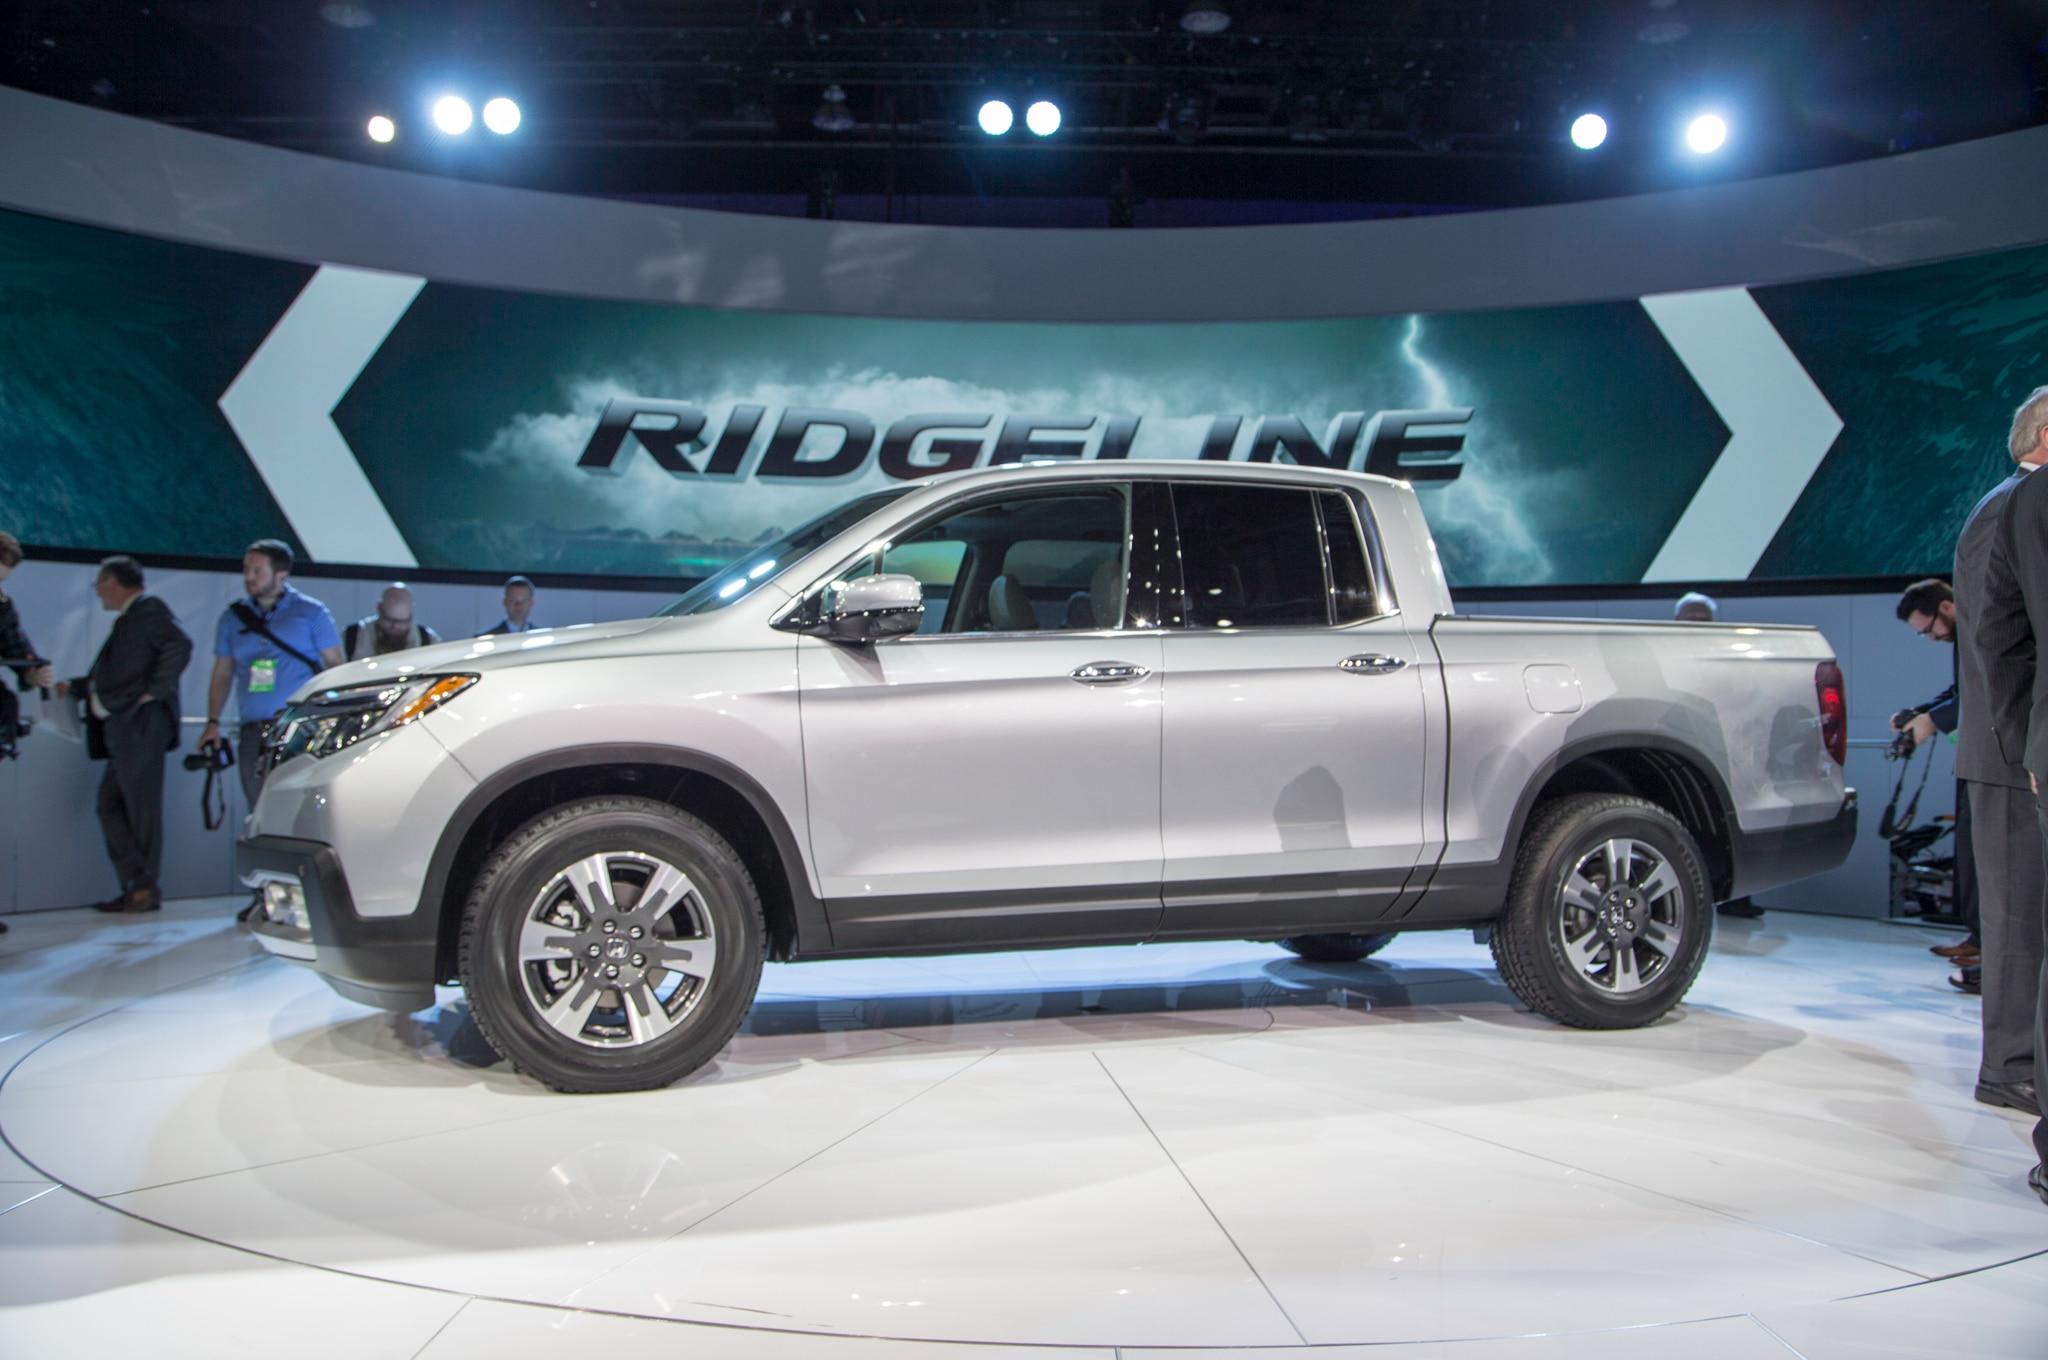 2017 Honda Ridgeline Rated Up to 26 MPG | Automobile Magazine